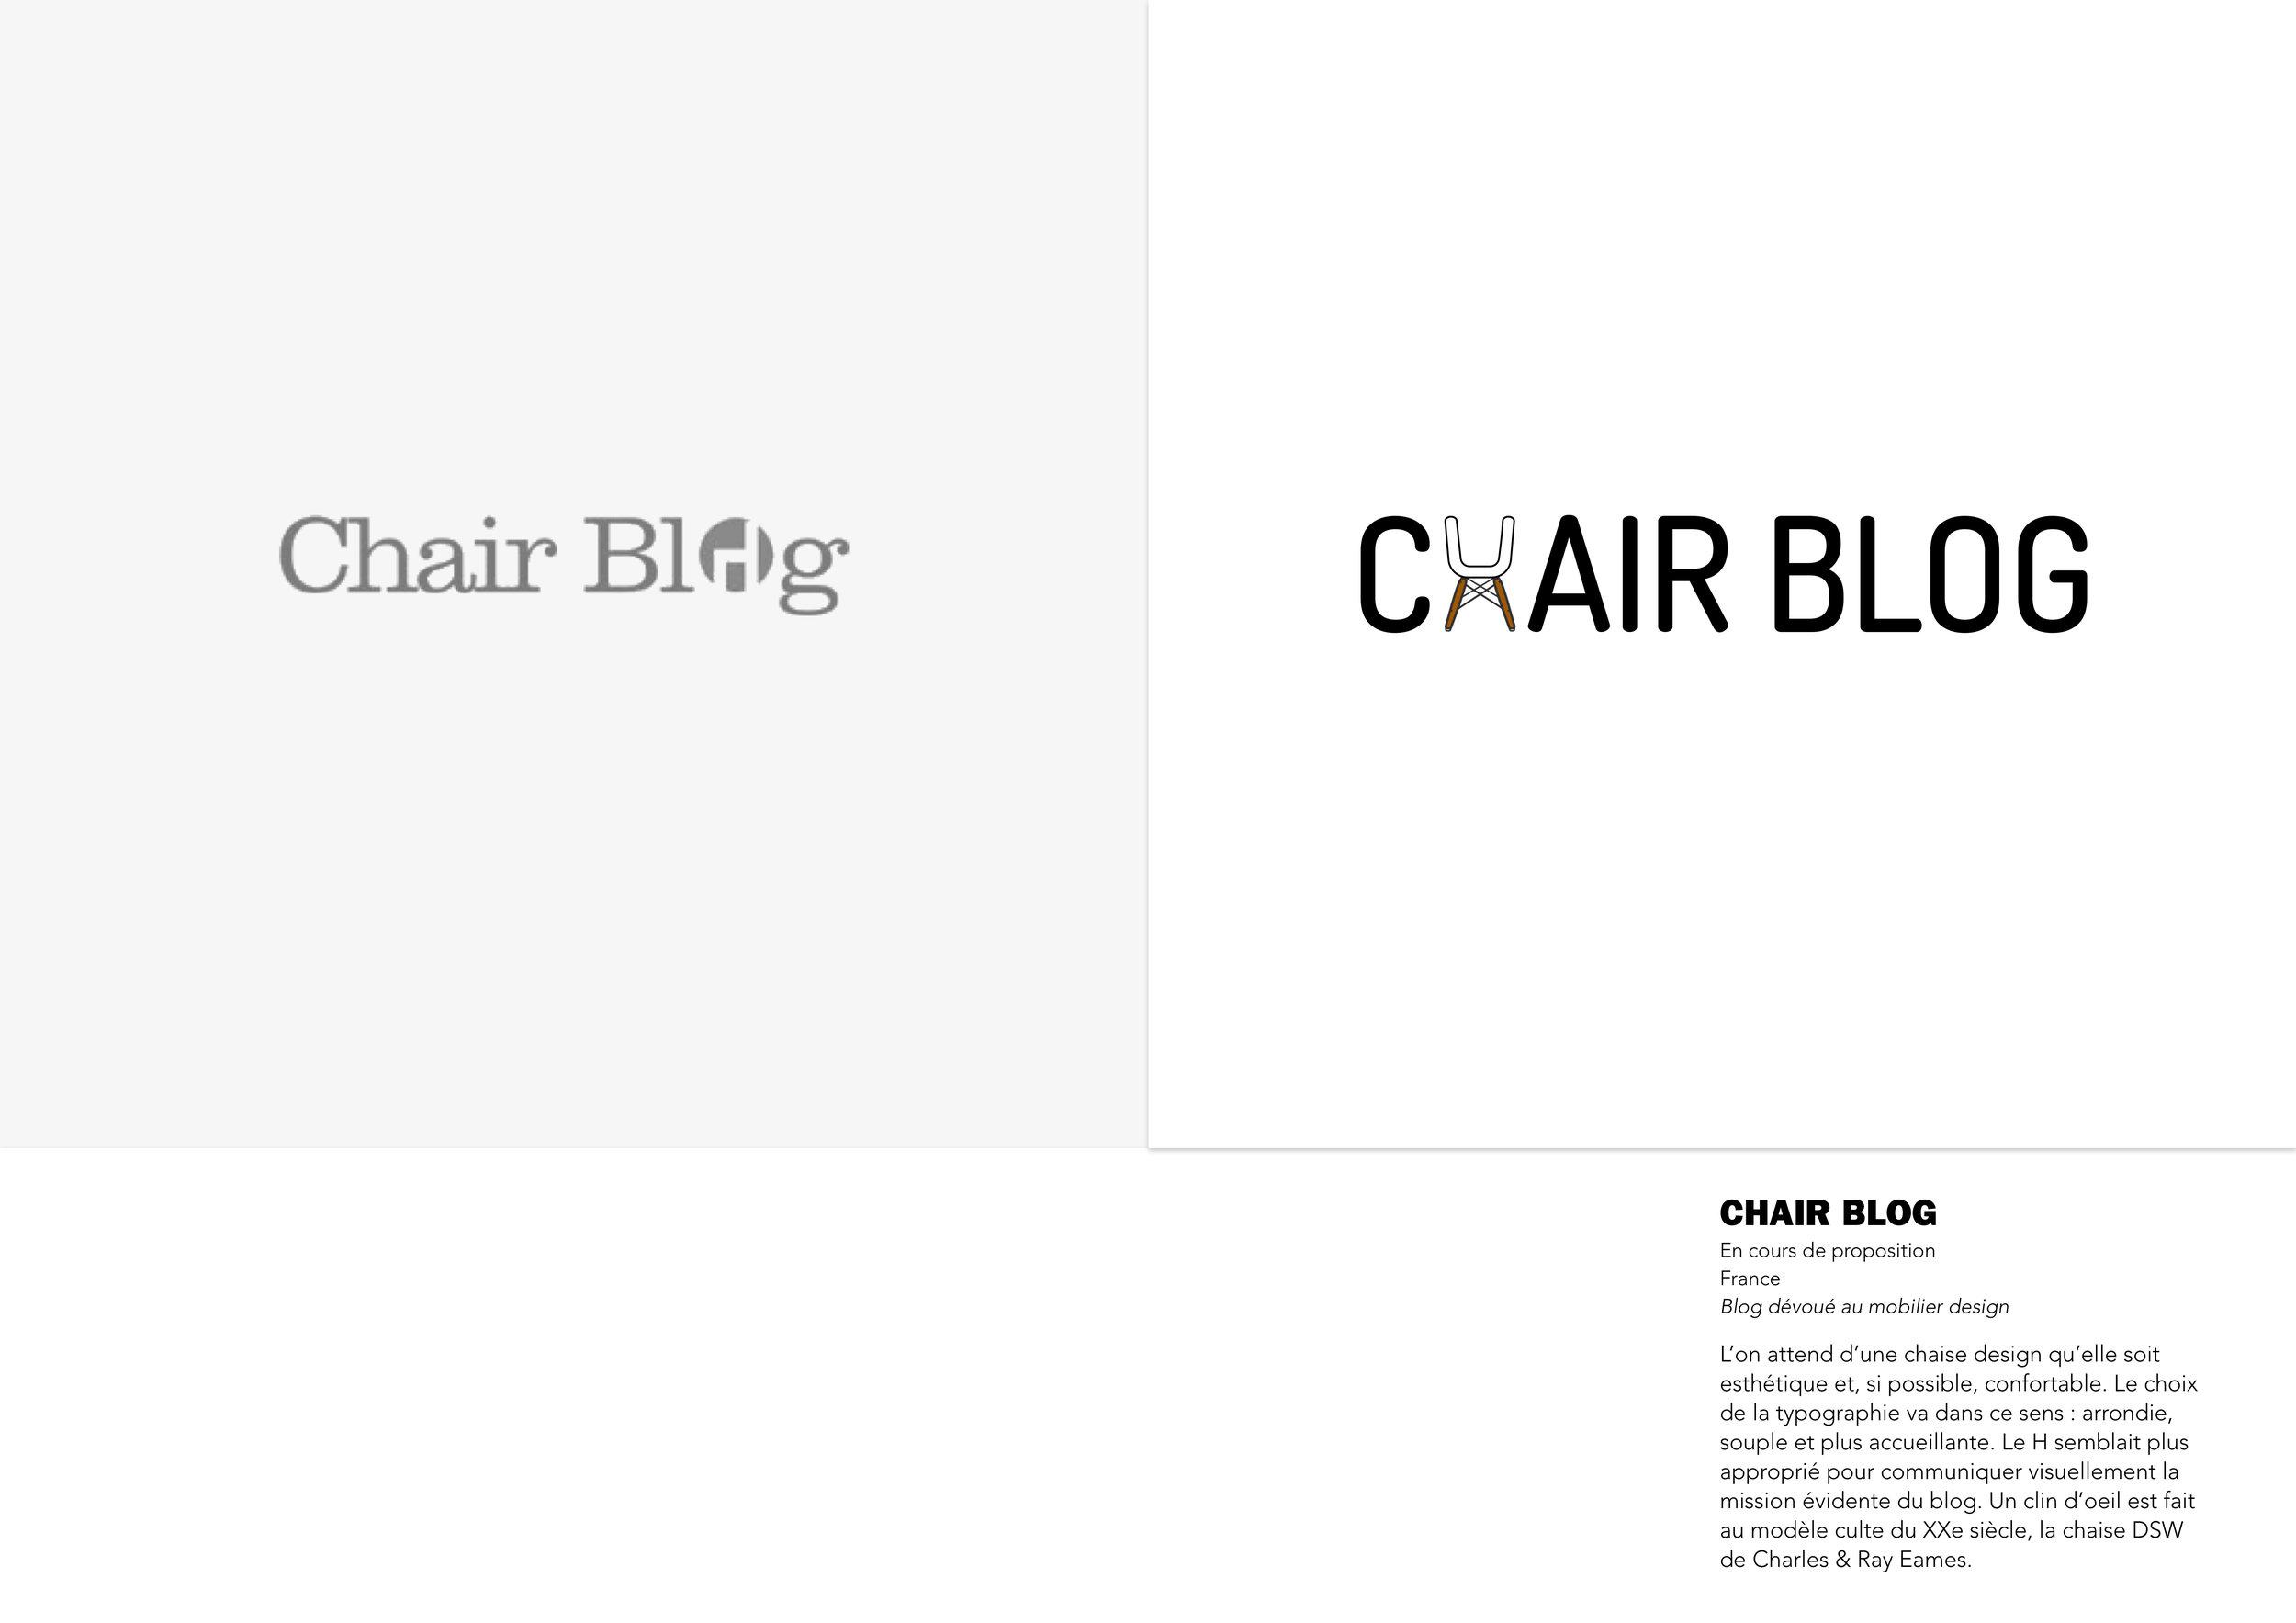 Chair-blog-logo-design-joy-lasry.jpg